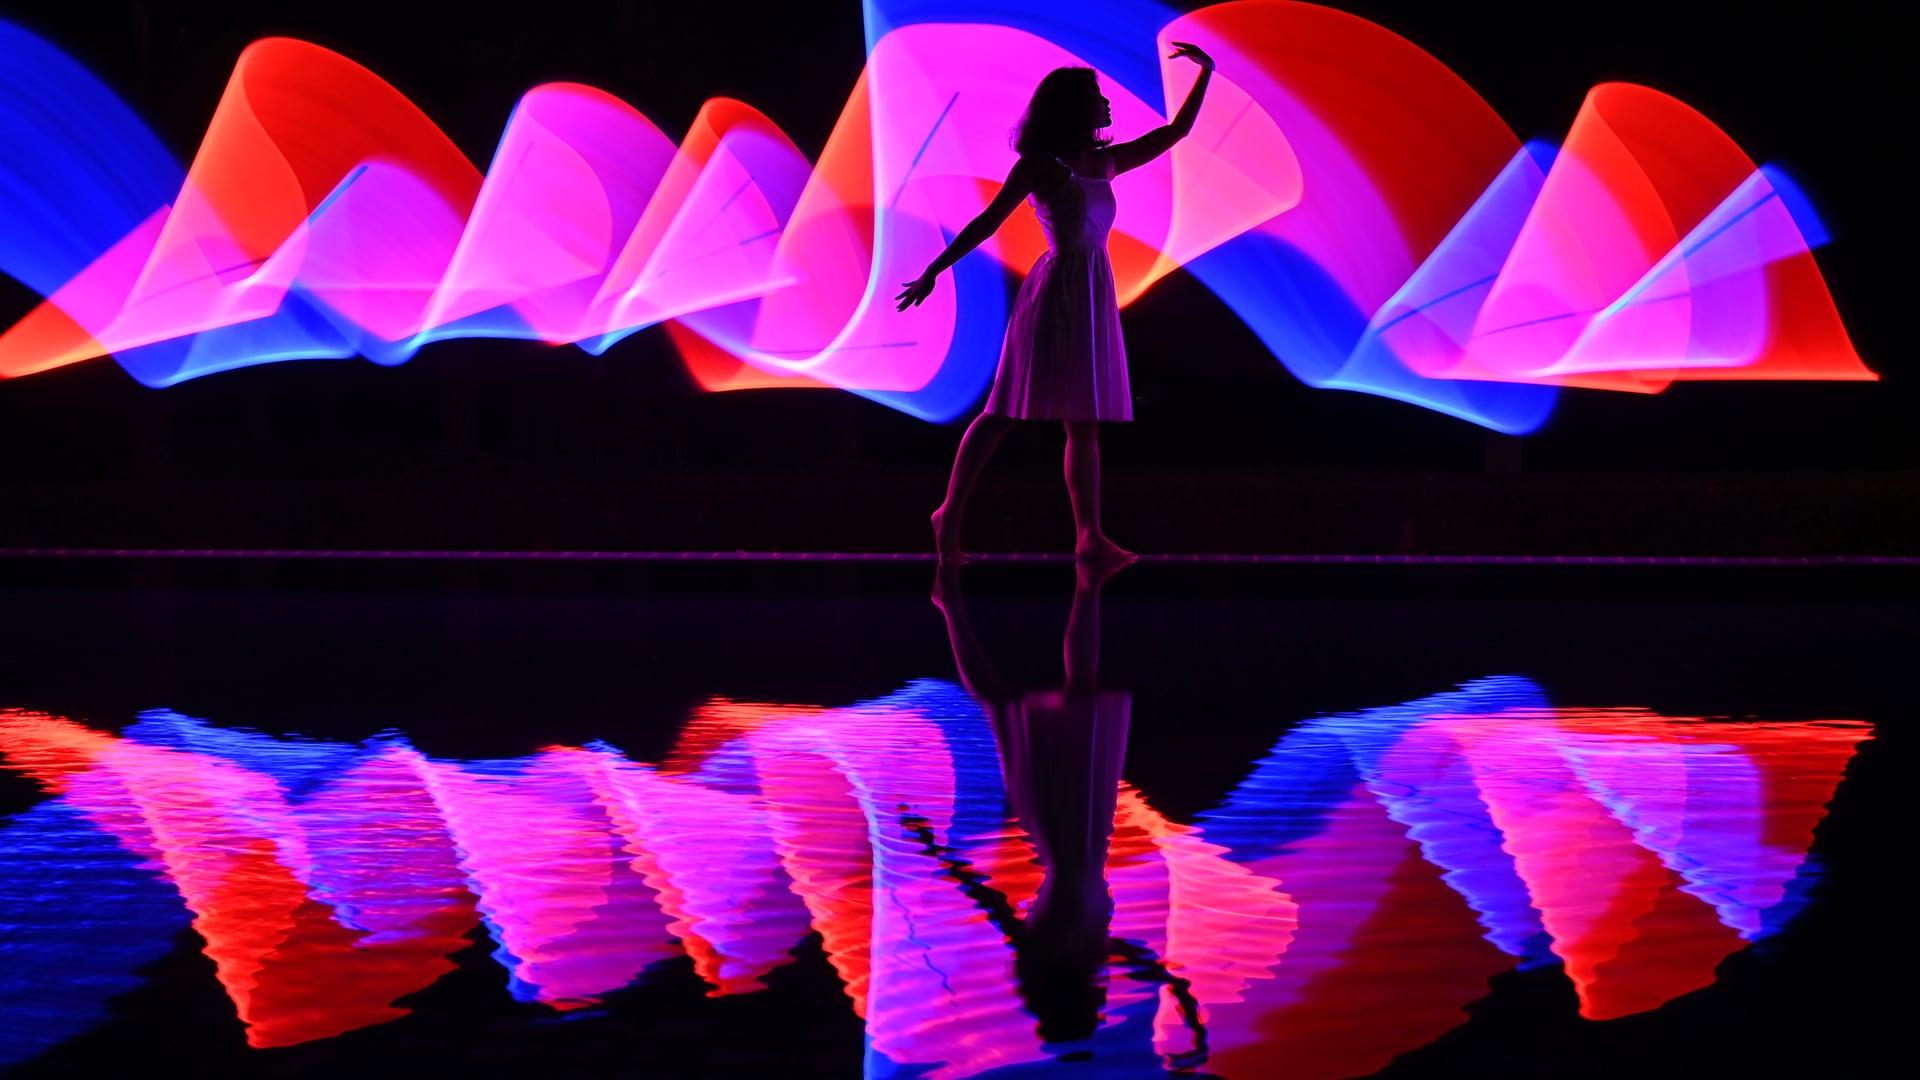 Nikon Youth Club : Light Painting